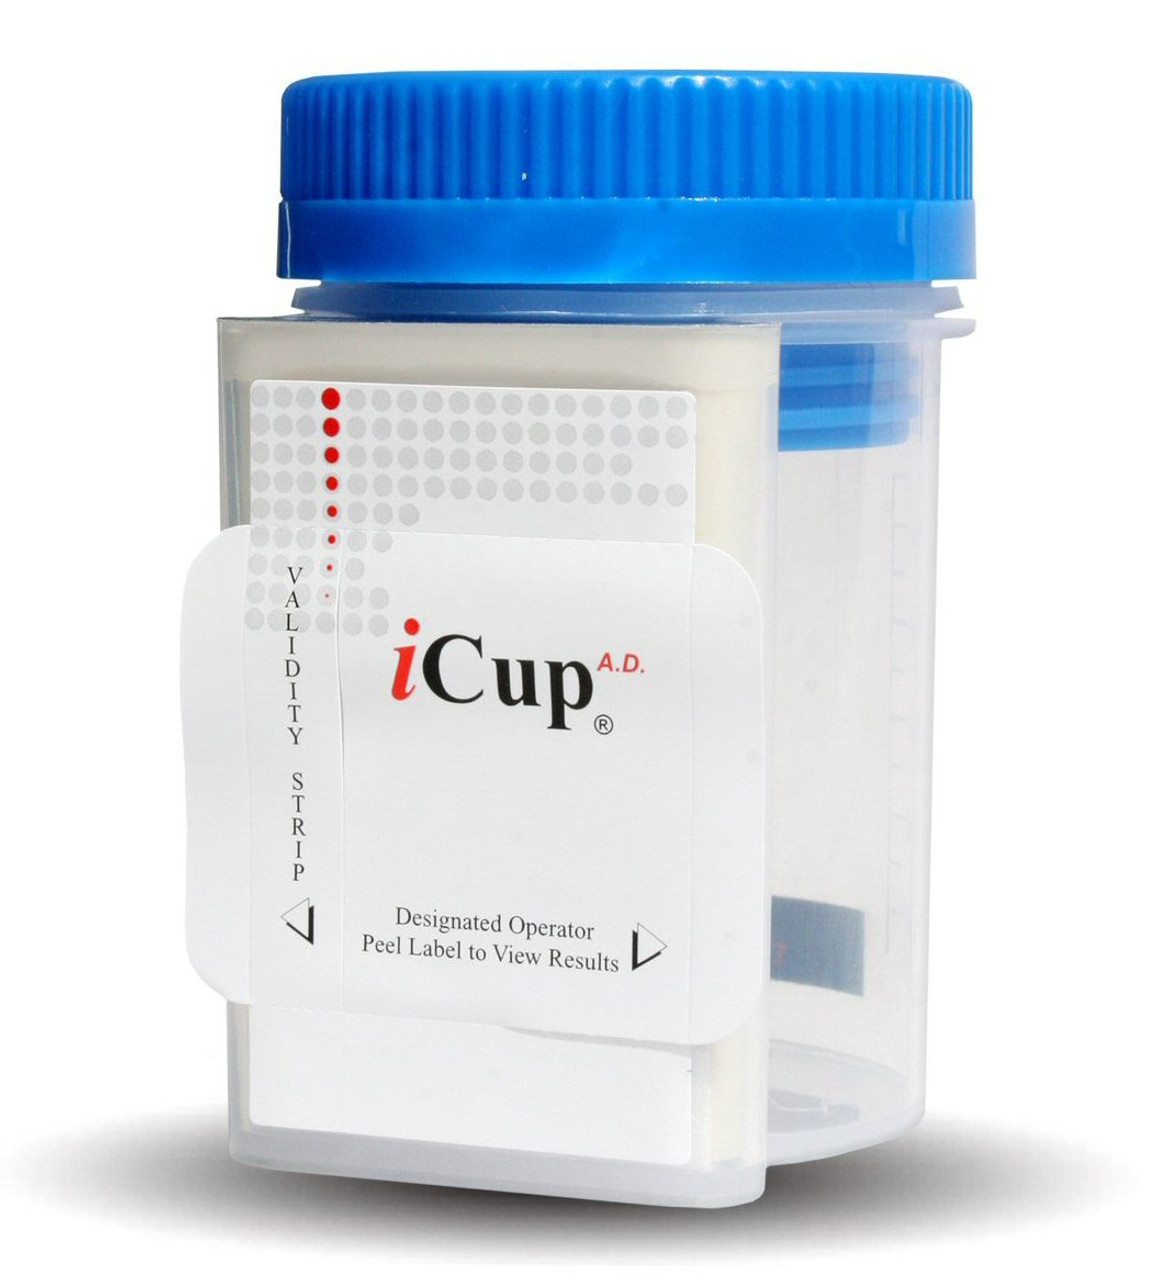 iCup 13 Panel Drug Test by Abbott Diagnostics